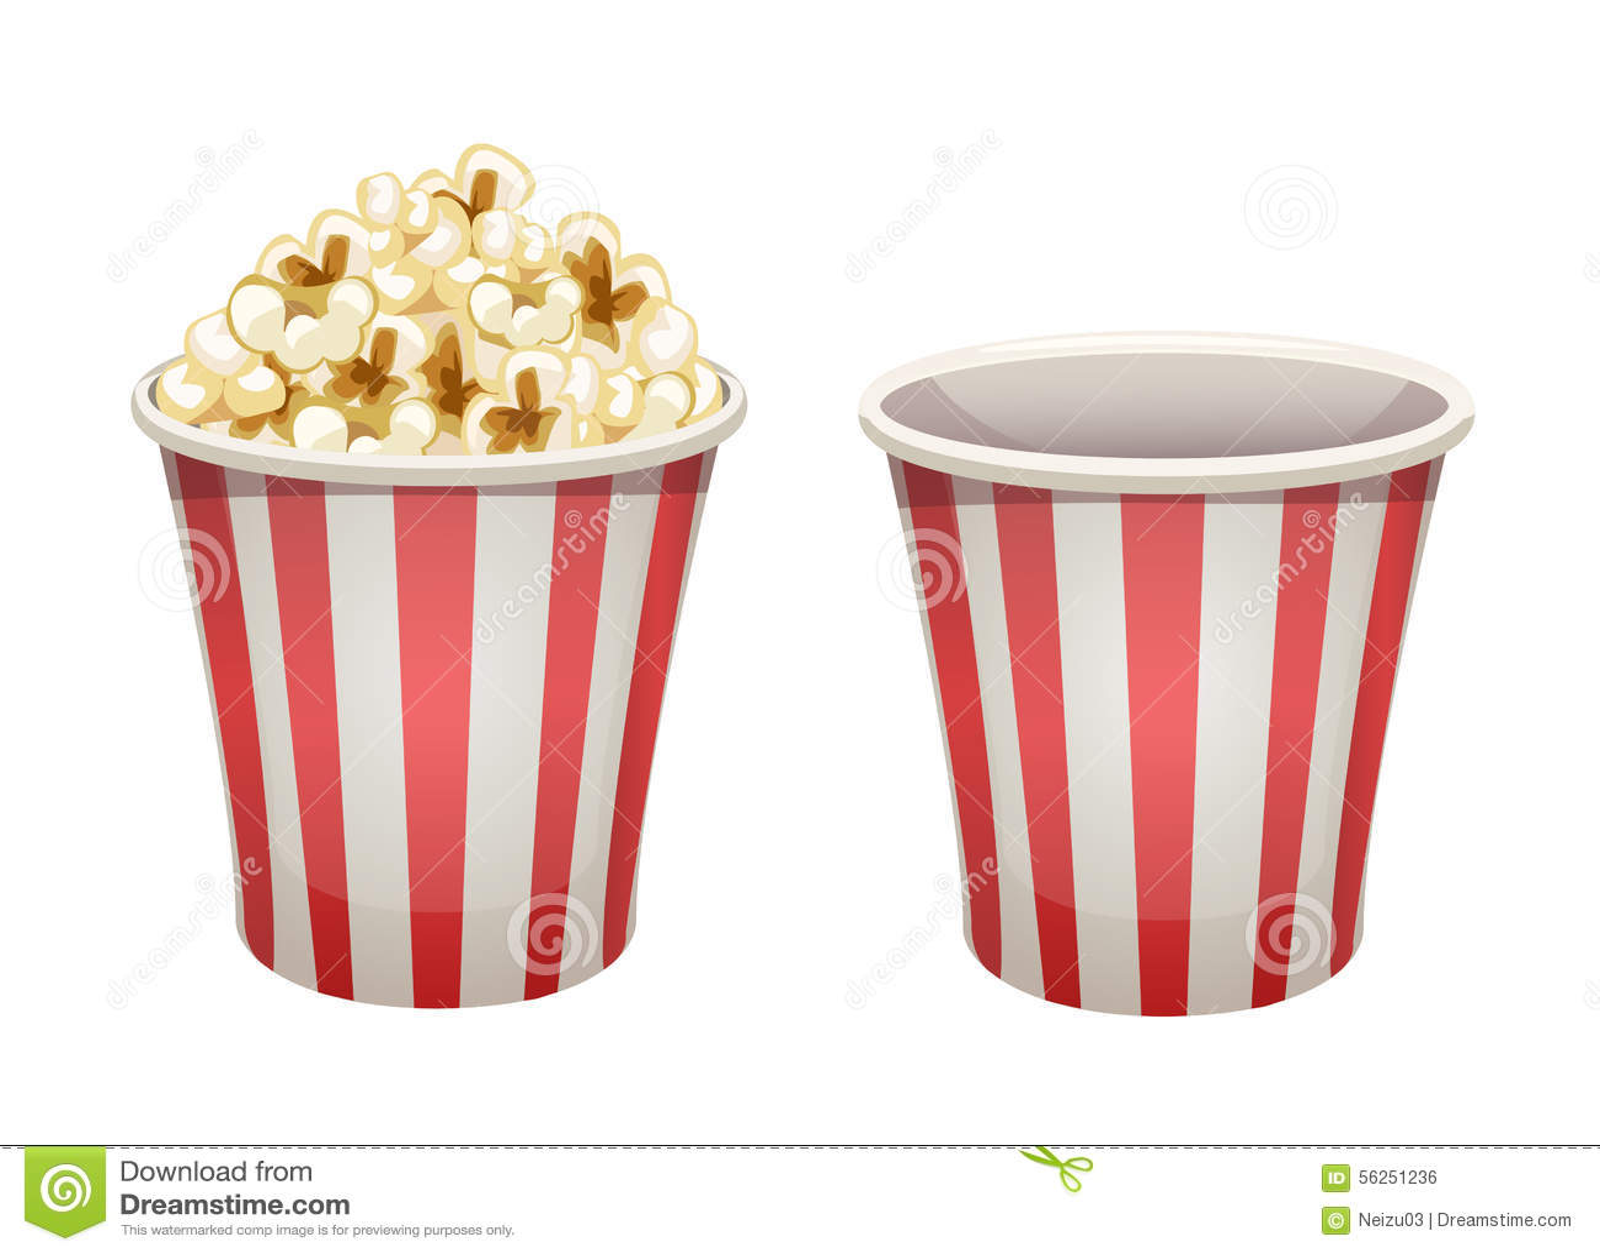 Popcorn Bucket Full And Empty Stock Illustration